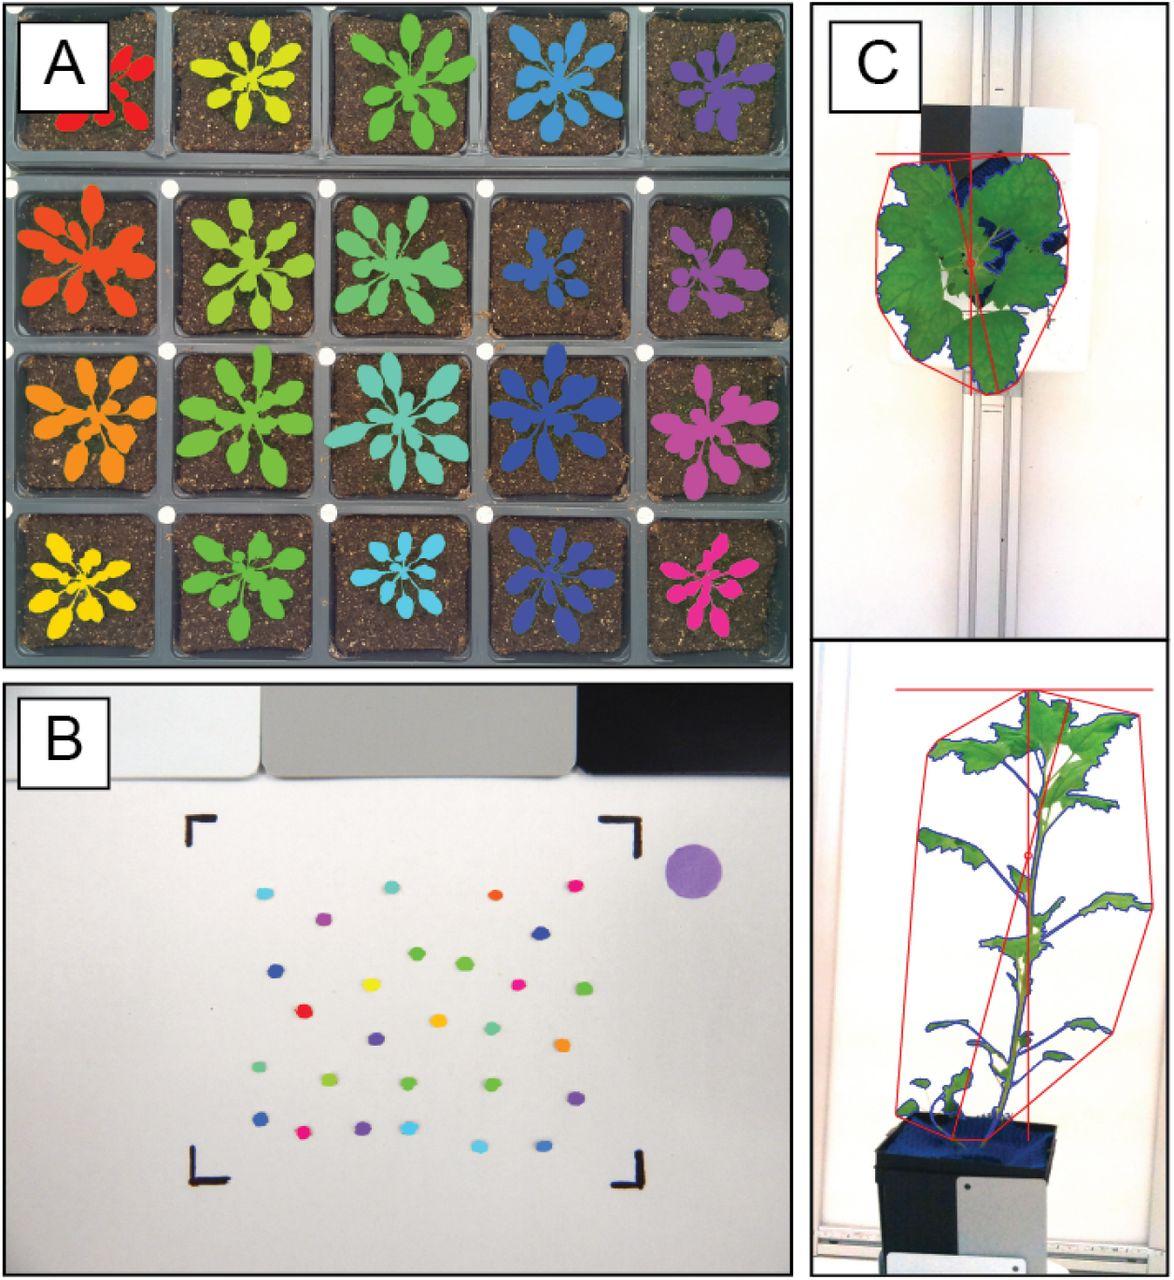 Raspberry Pi Powered Imaging for Plant Phenotyping | bioRxiv